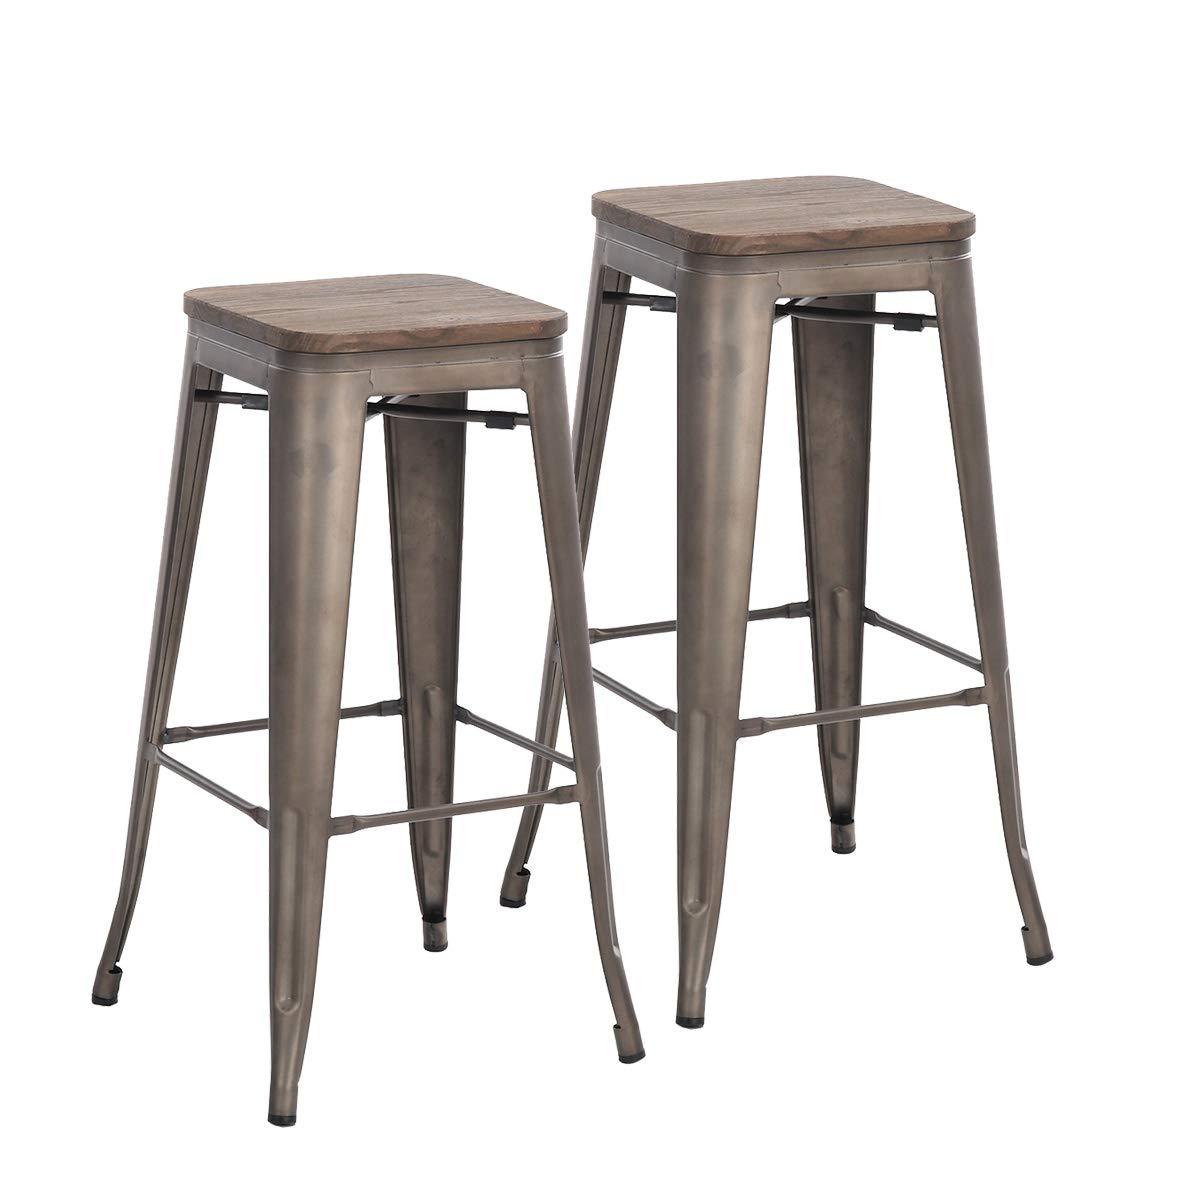 Amazoncom Buschman Set Of 2 Bronze Wooden Seat 30 Inch Bar Height